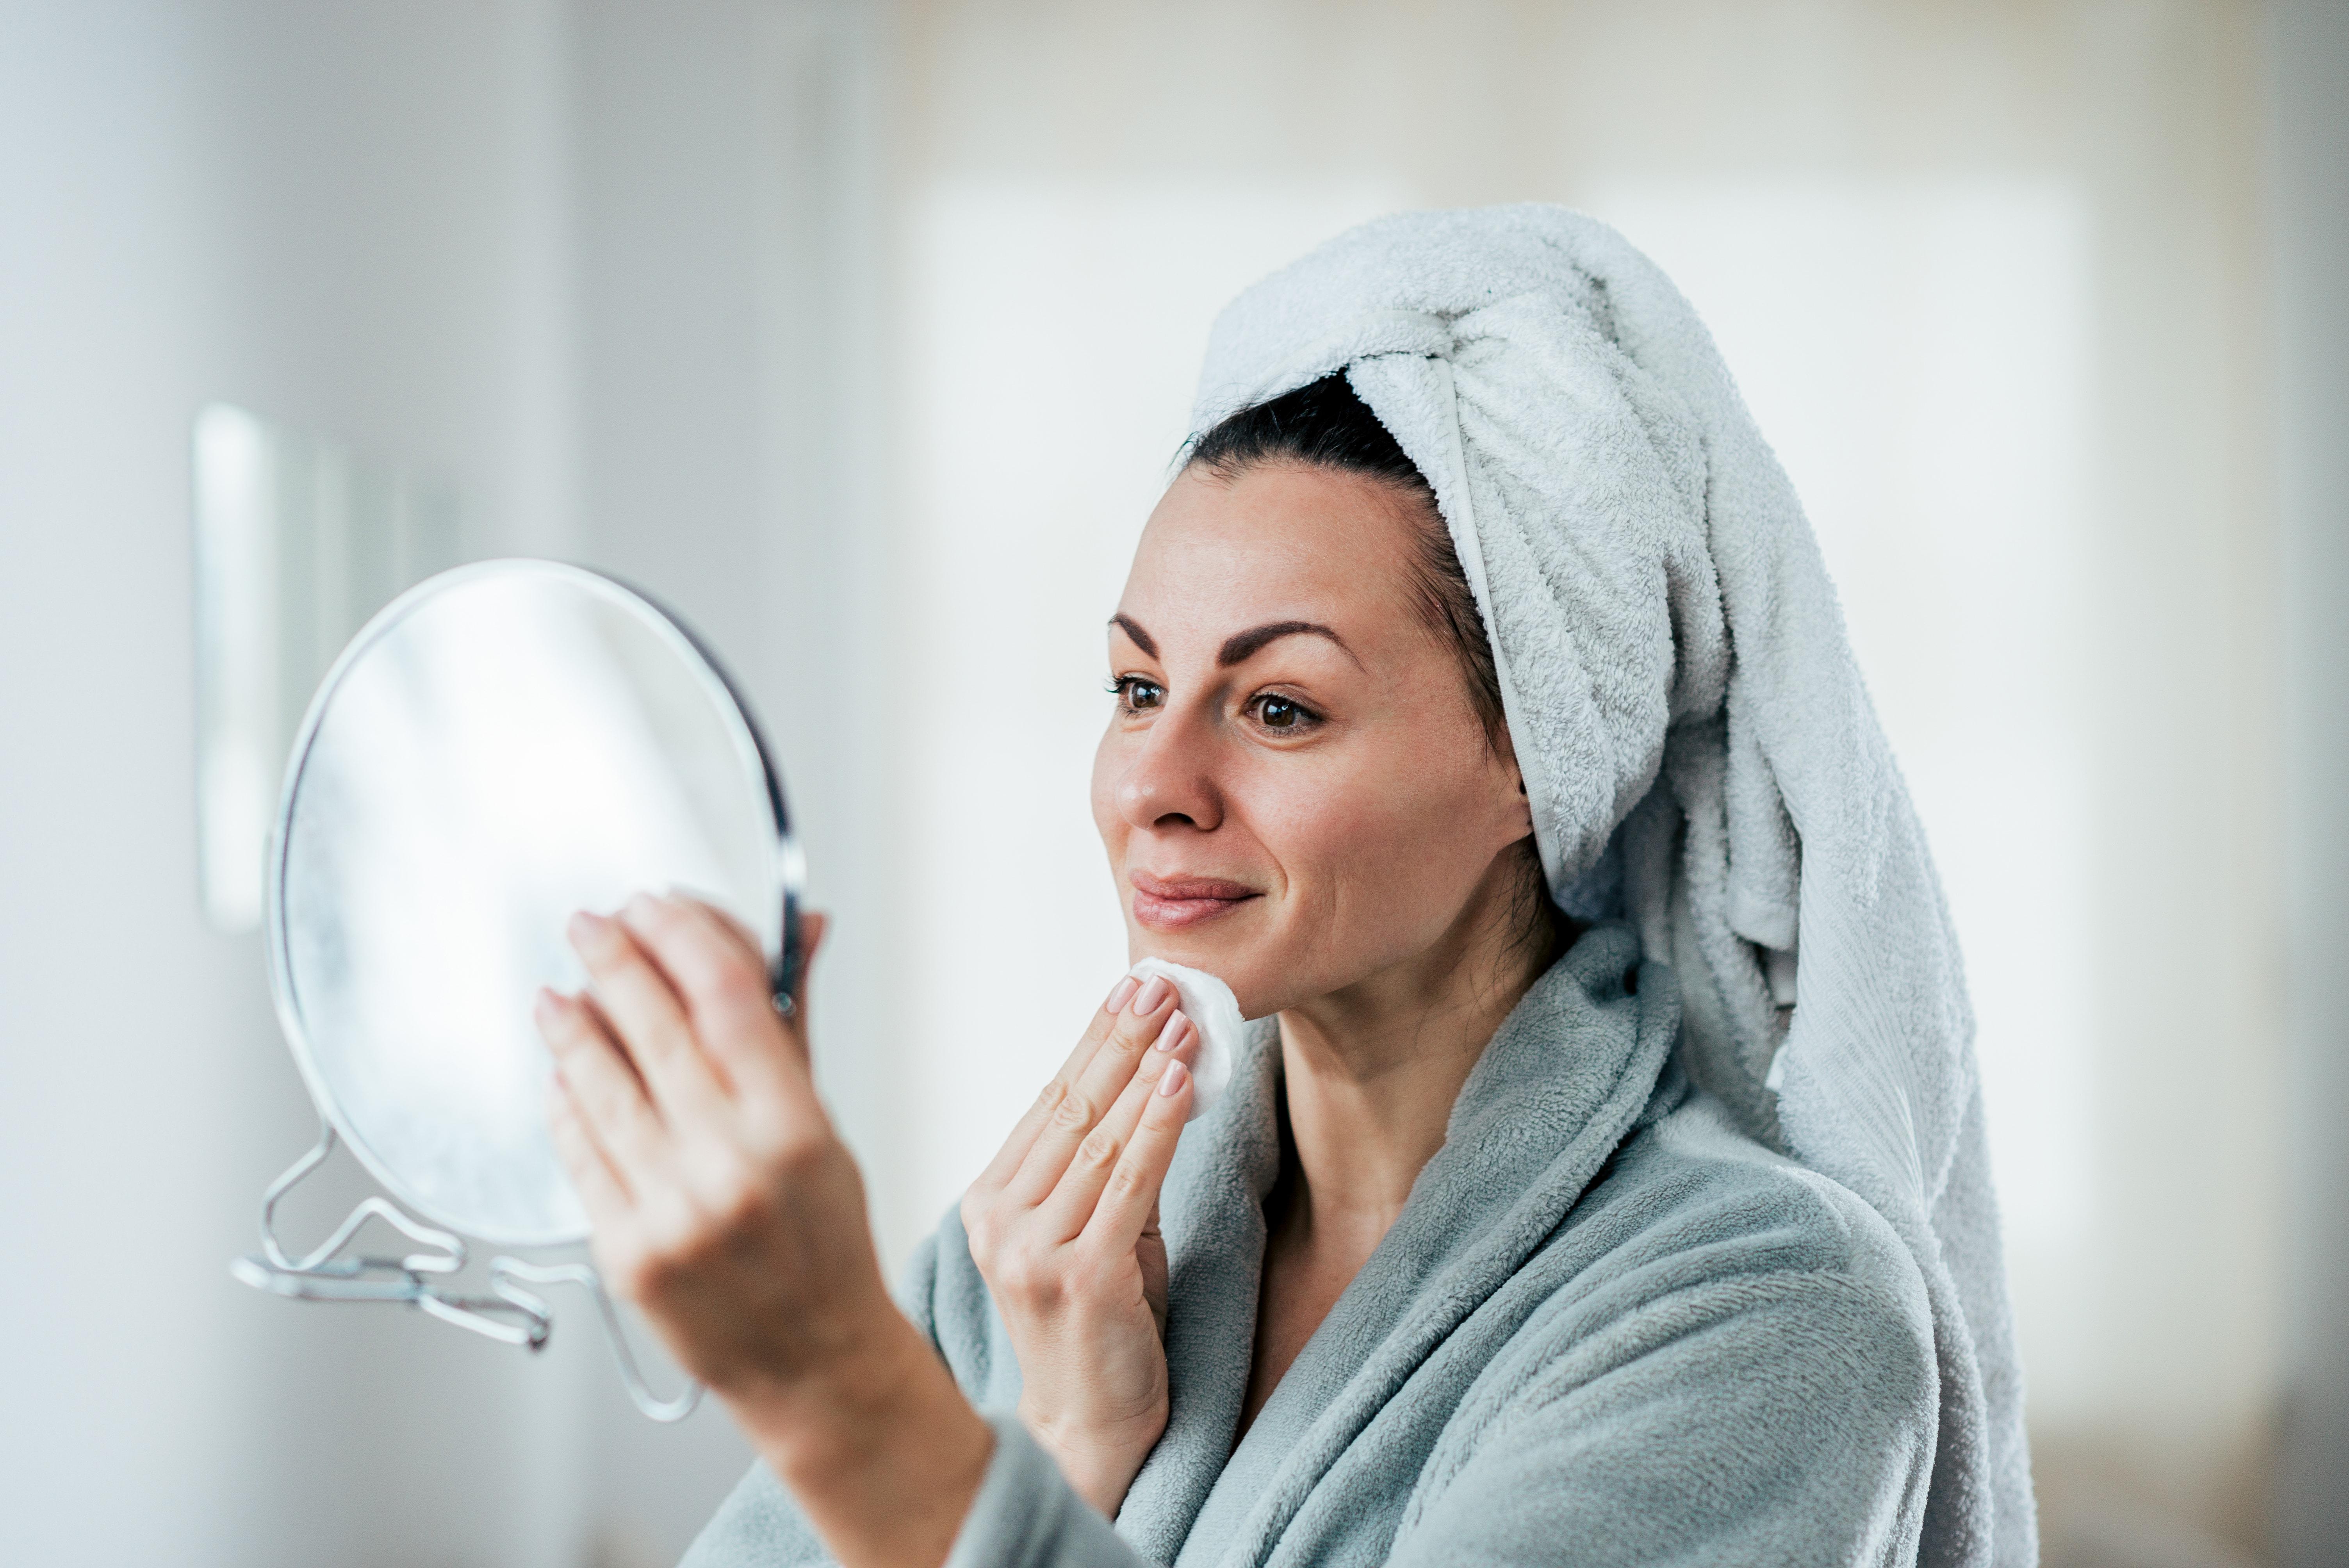 skin health, skincare, skin month, skincare routine, rosacea, skin condition